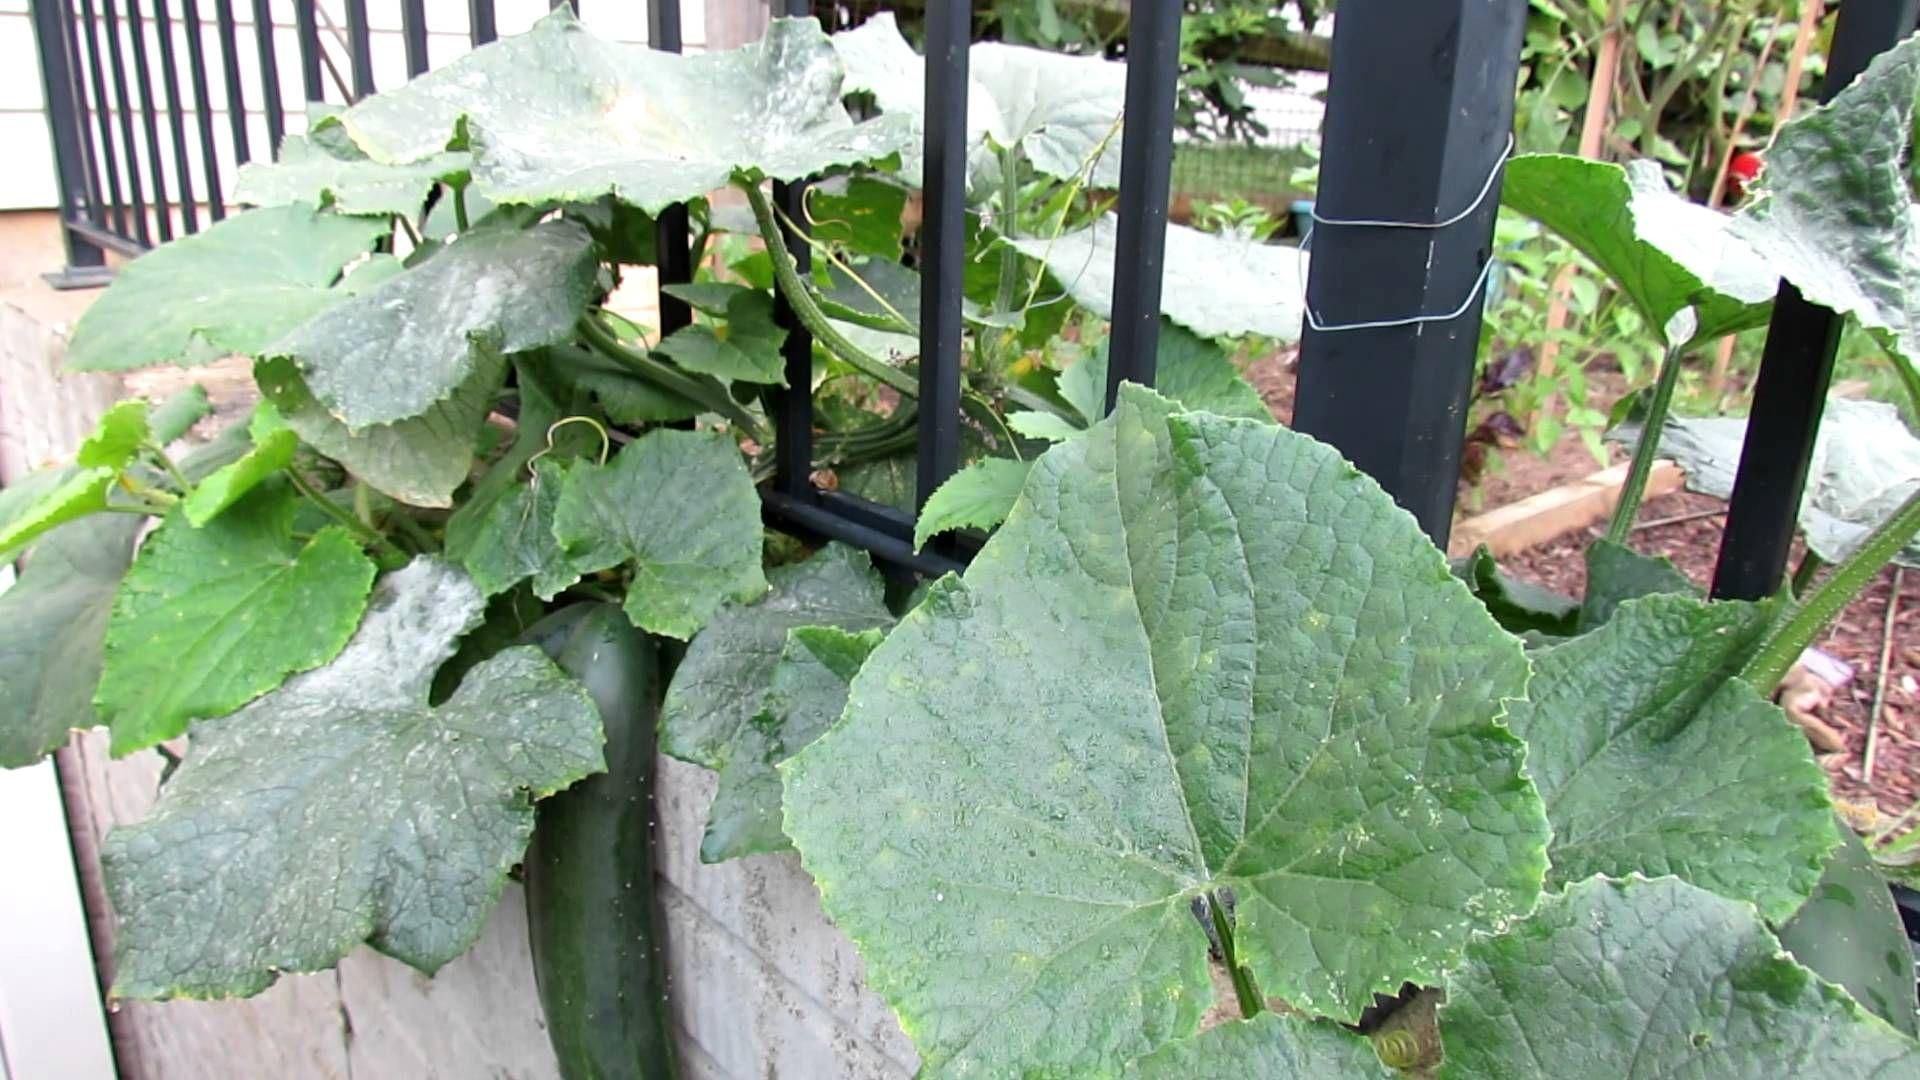 9b4c23fab07b8d55b82608a29e8f7127 - How To Get Rid Of White Mold On Cucumber Plants